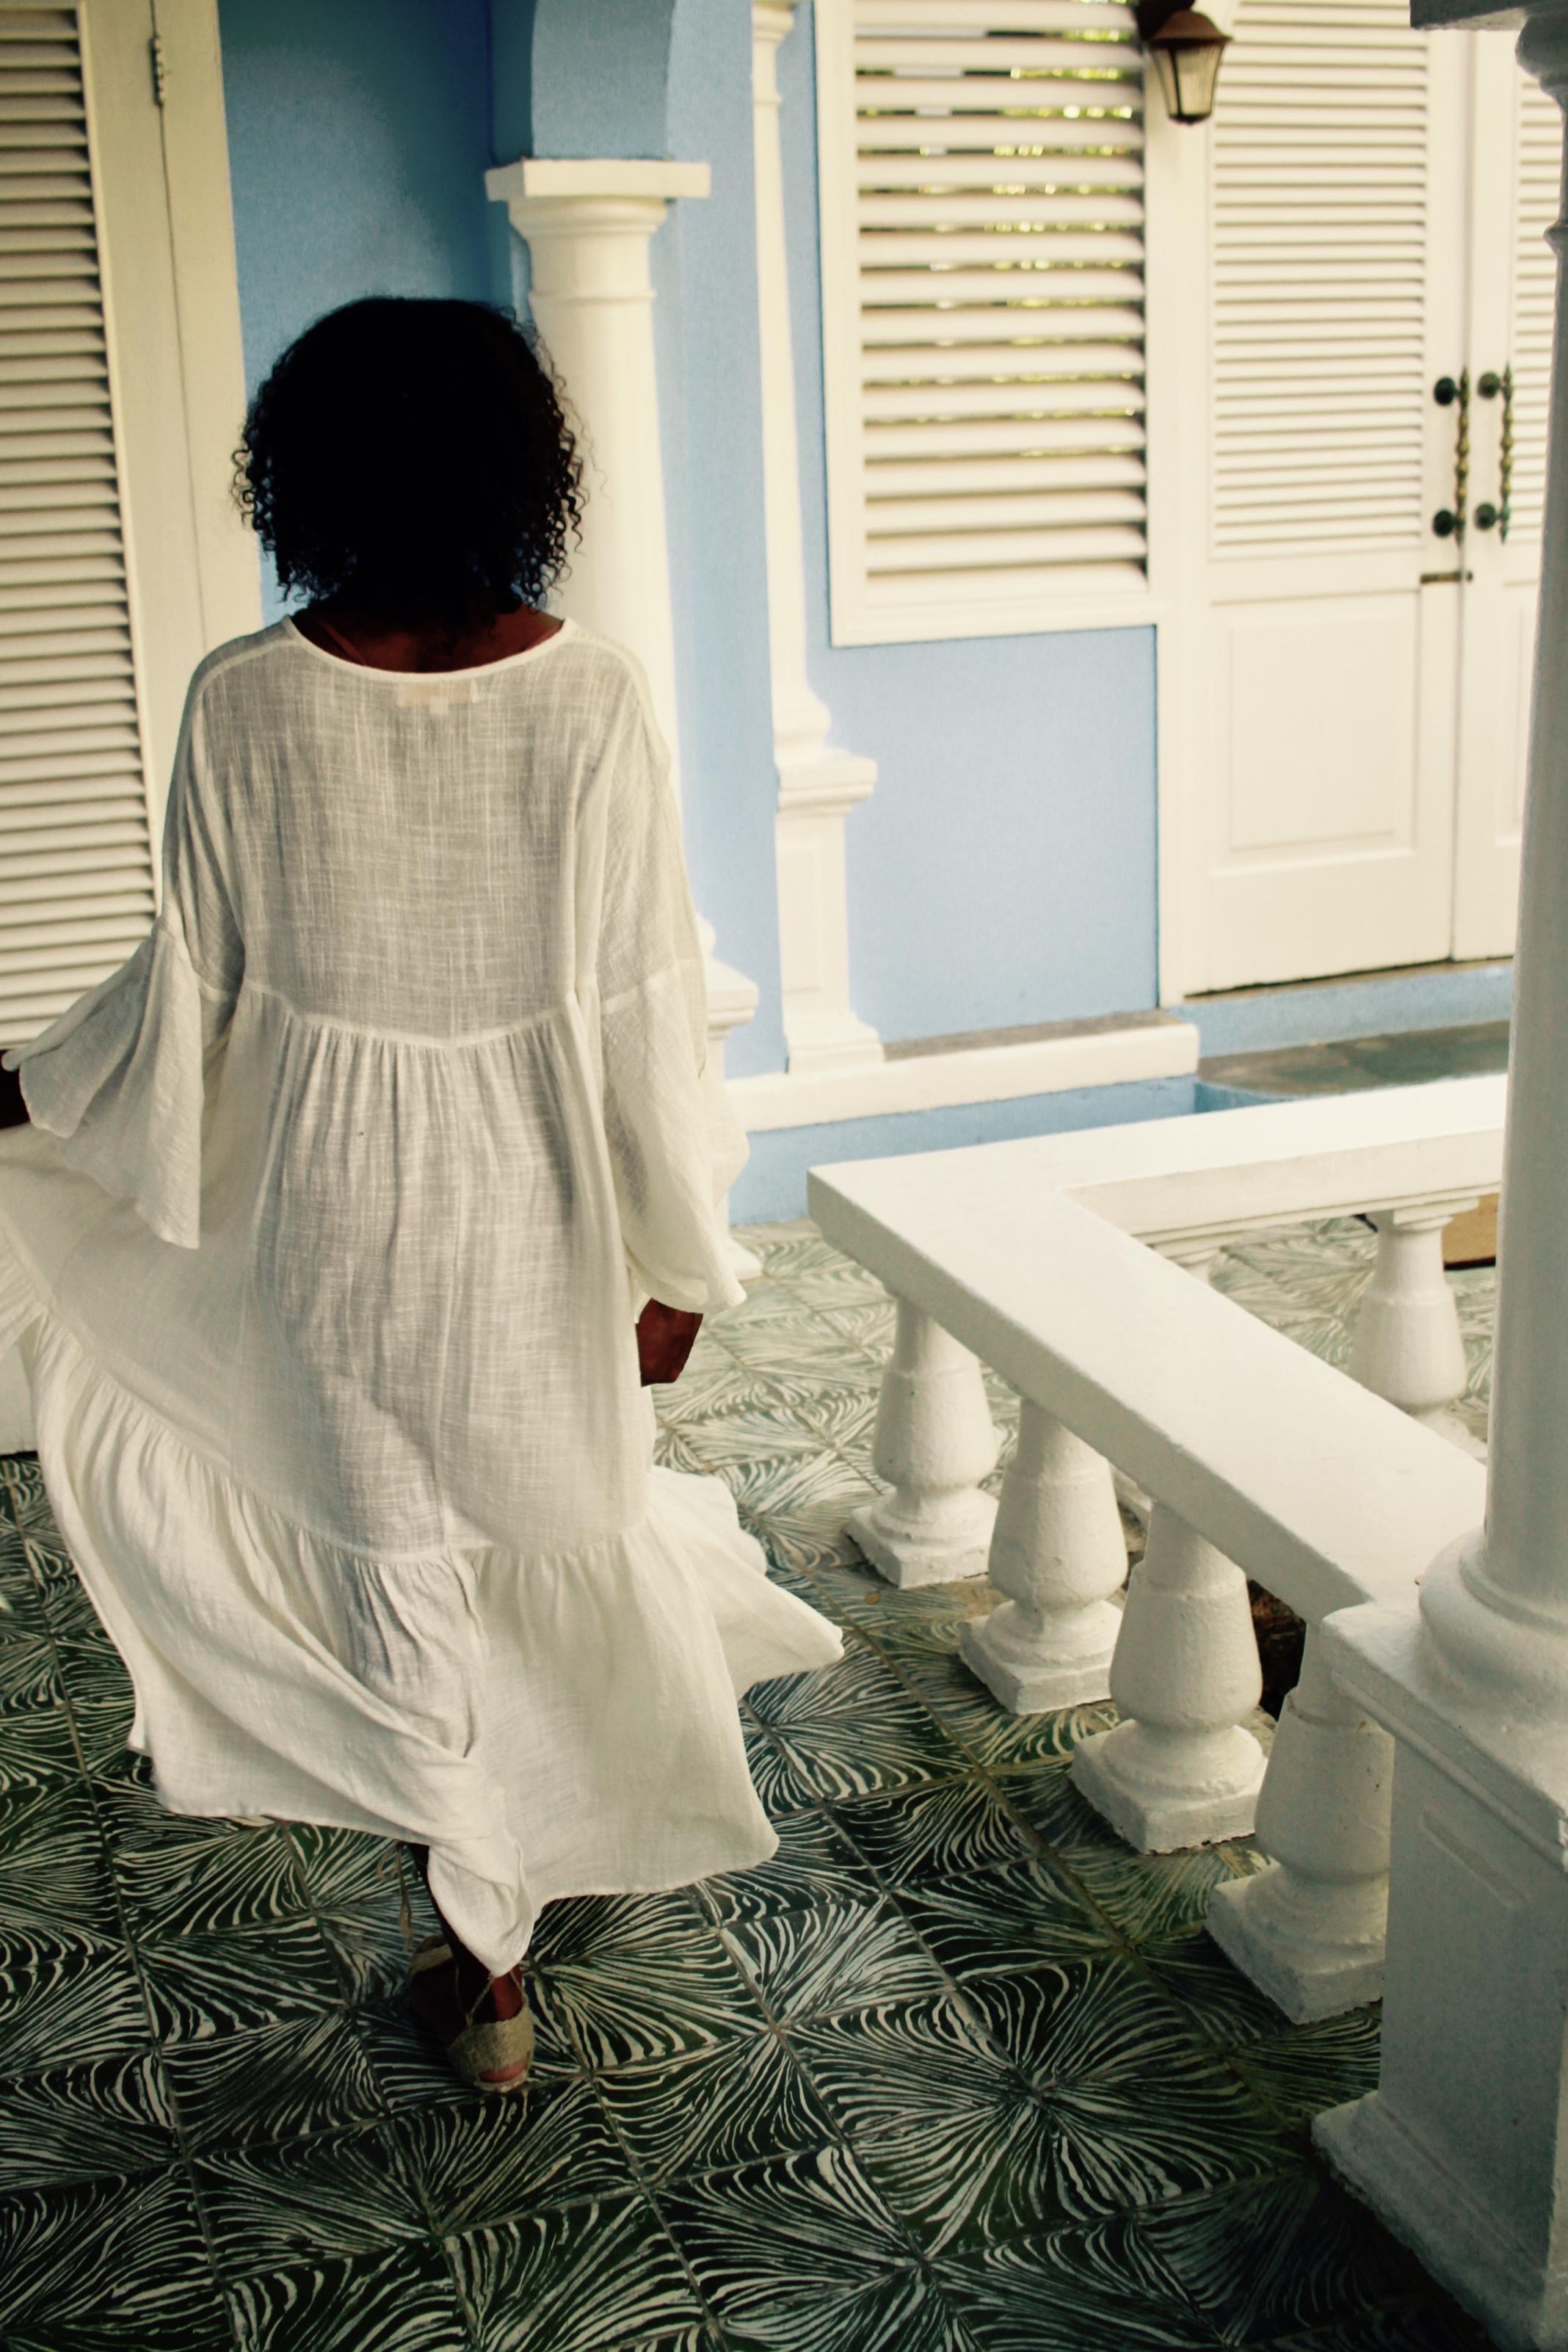 Fernanda Dress by   Natalie Martin  available   here   Handmade Spanish Espadrilles available   here